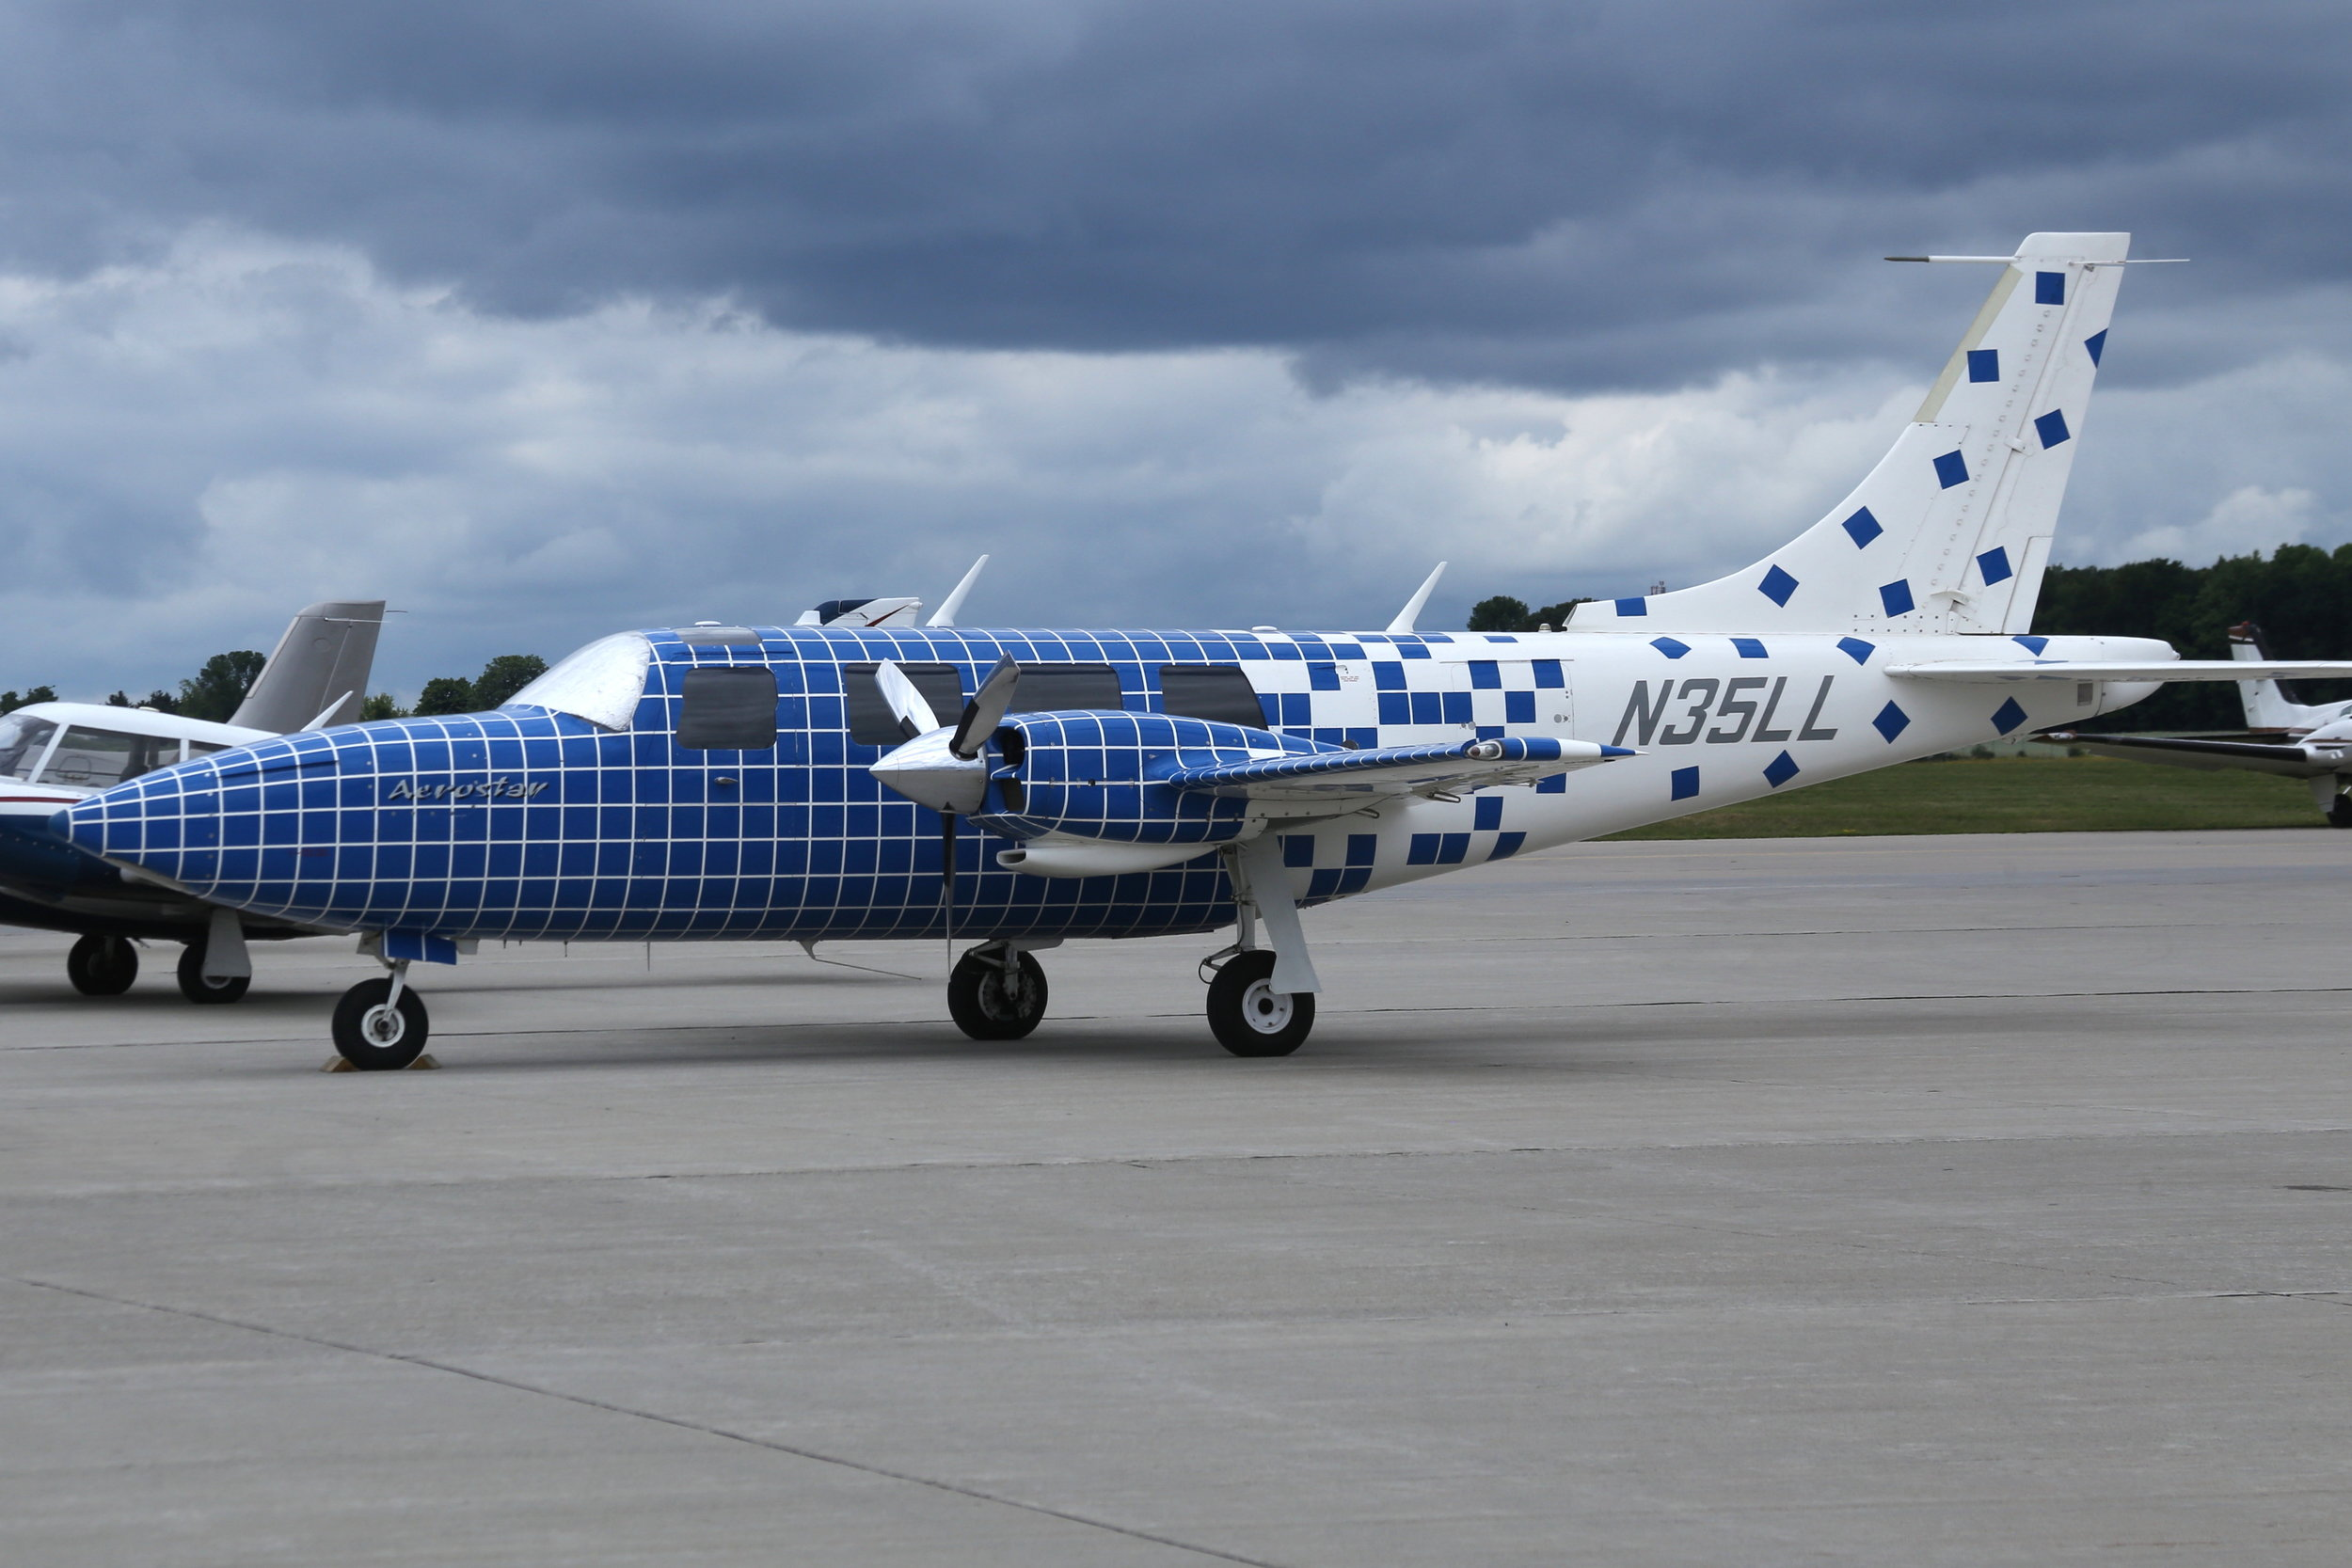 N35LL Mini Computer Consultancy Aerostar 601P taken at Appleton 26th July 2018 by John Wood